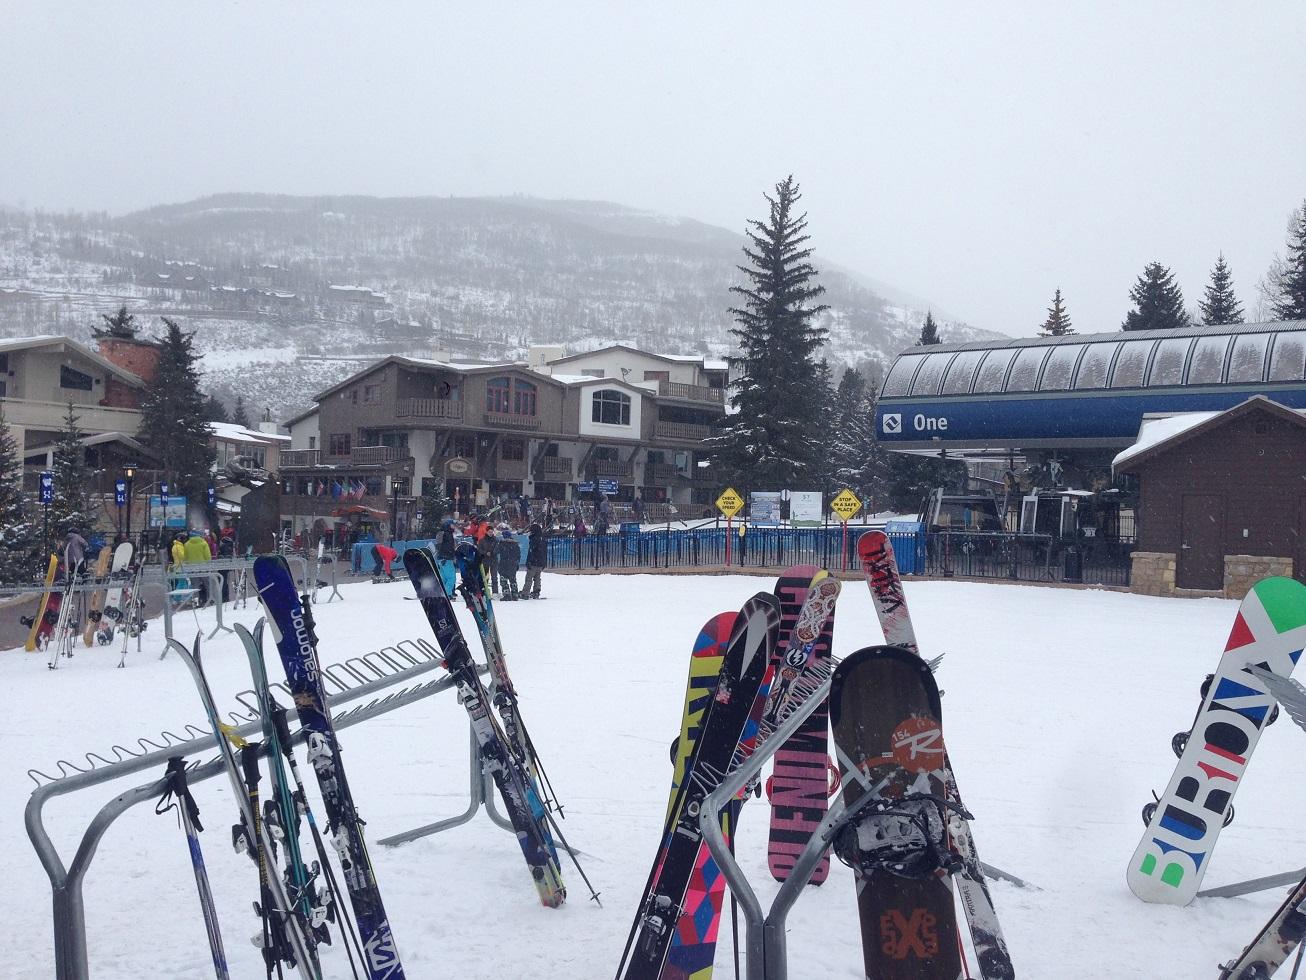 Vail滑雪场 (12).JPG